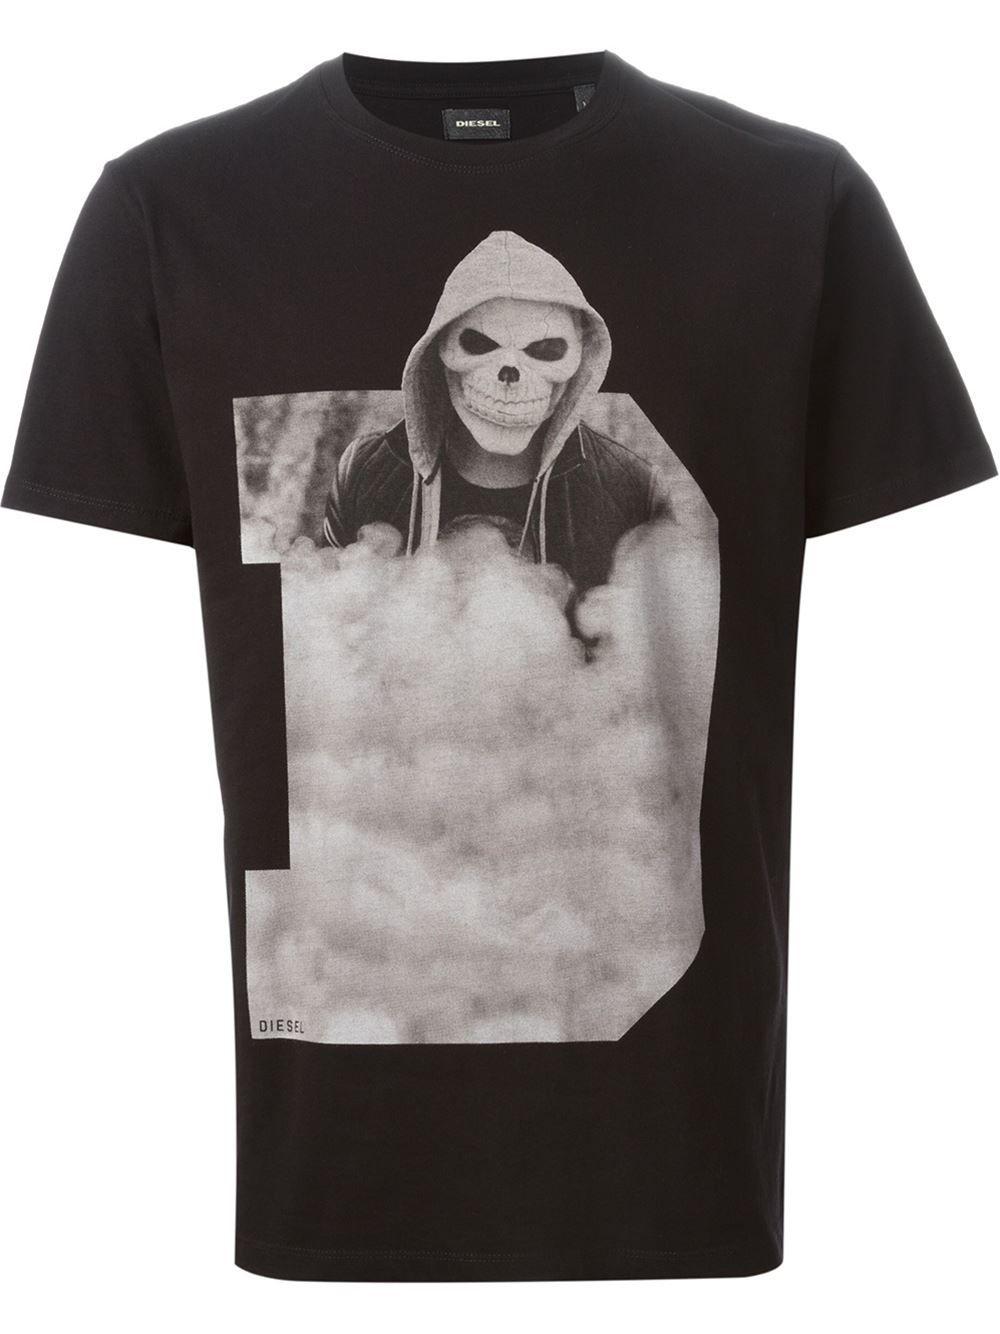 bb254bb07ea Diesel  t-triset  T-shirt - Vitkac - Farfetch.com